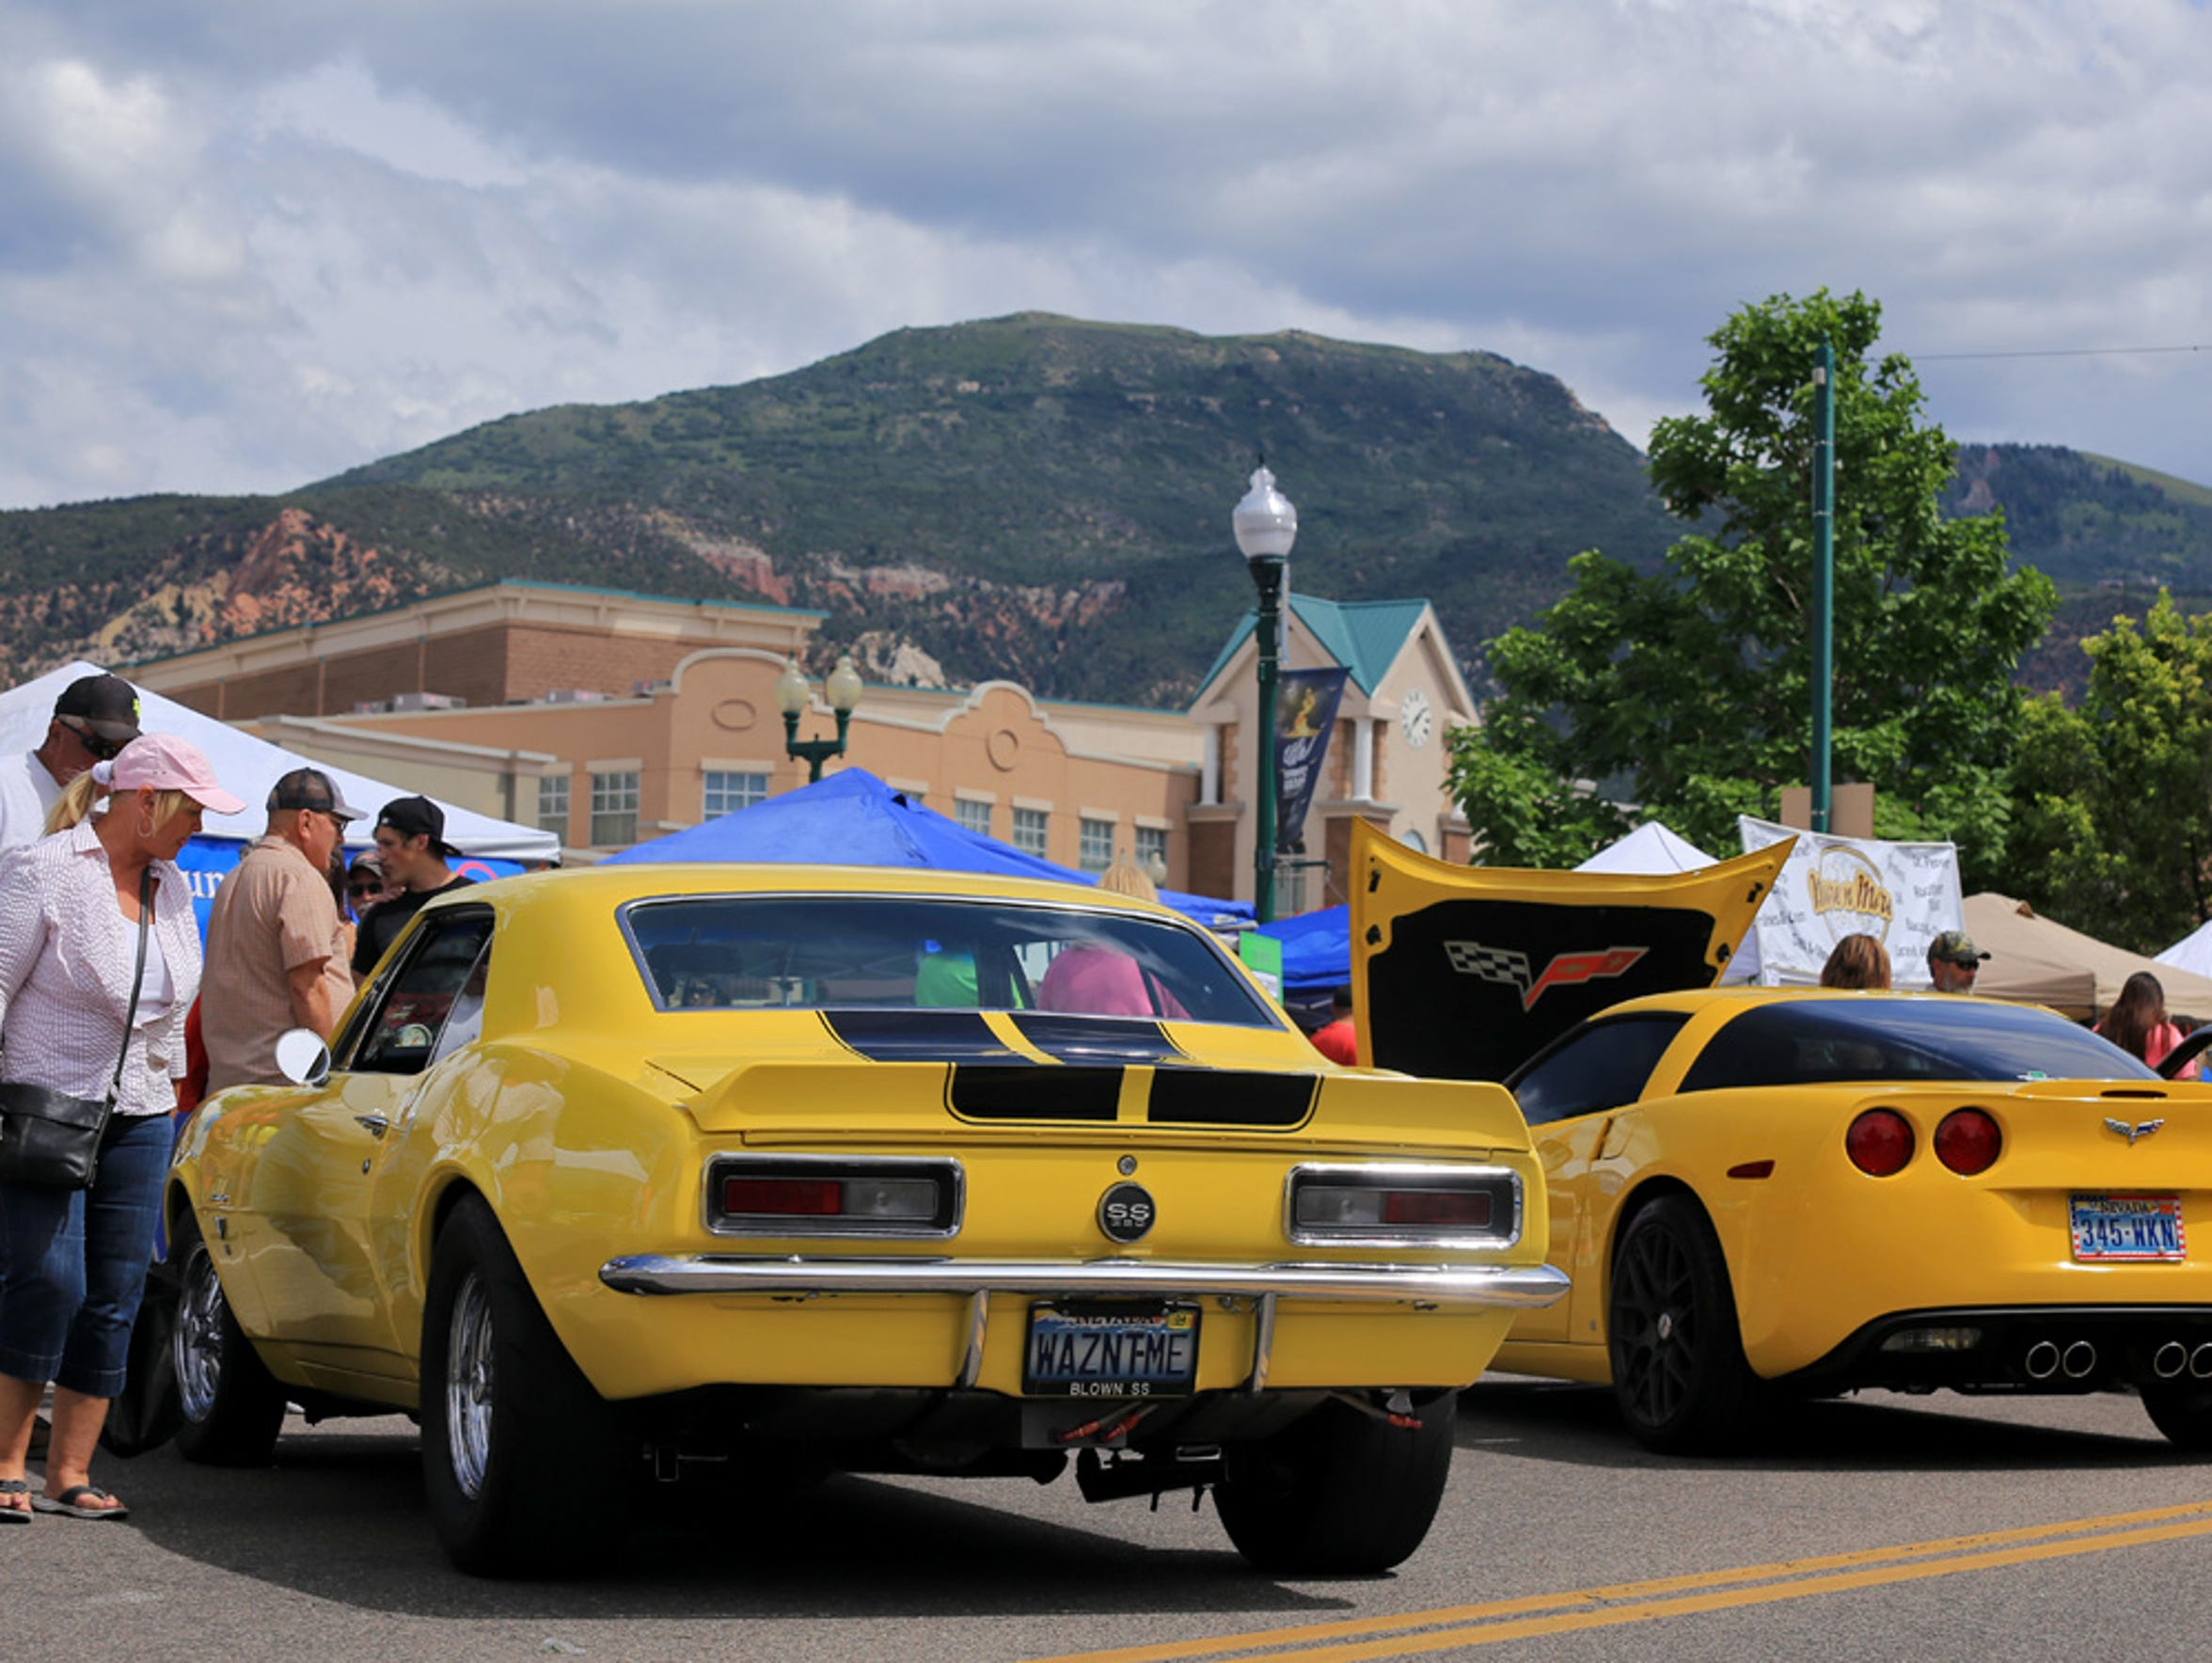 The July Jamboree took over Main Street on Saturday